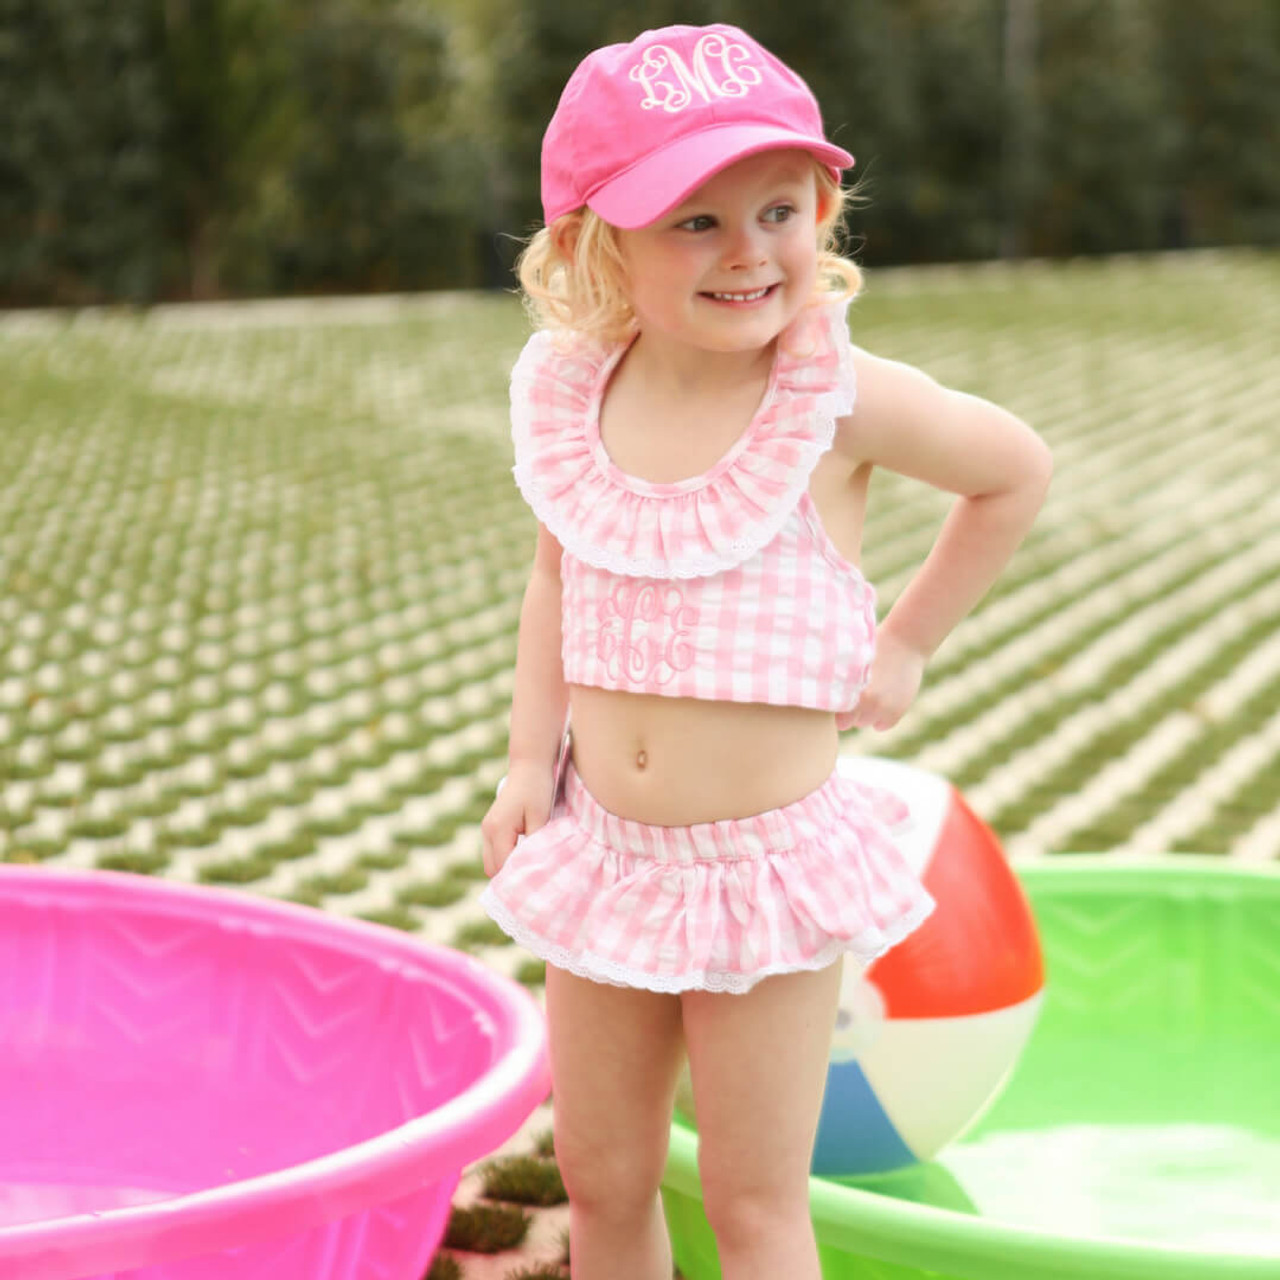 243ac8c3411 Pink Check Seersucker and Eyelet Ruffle Bikini (ISCL524-BIK30-18)